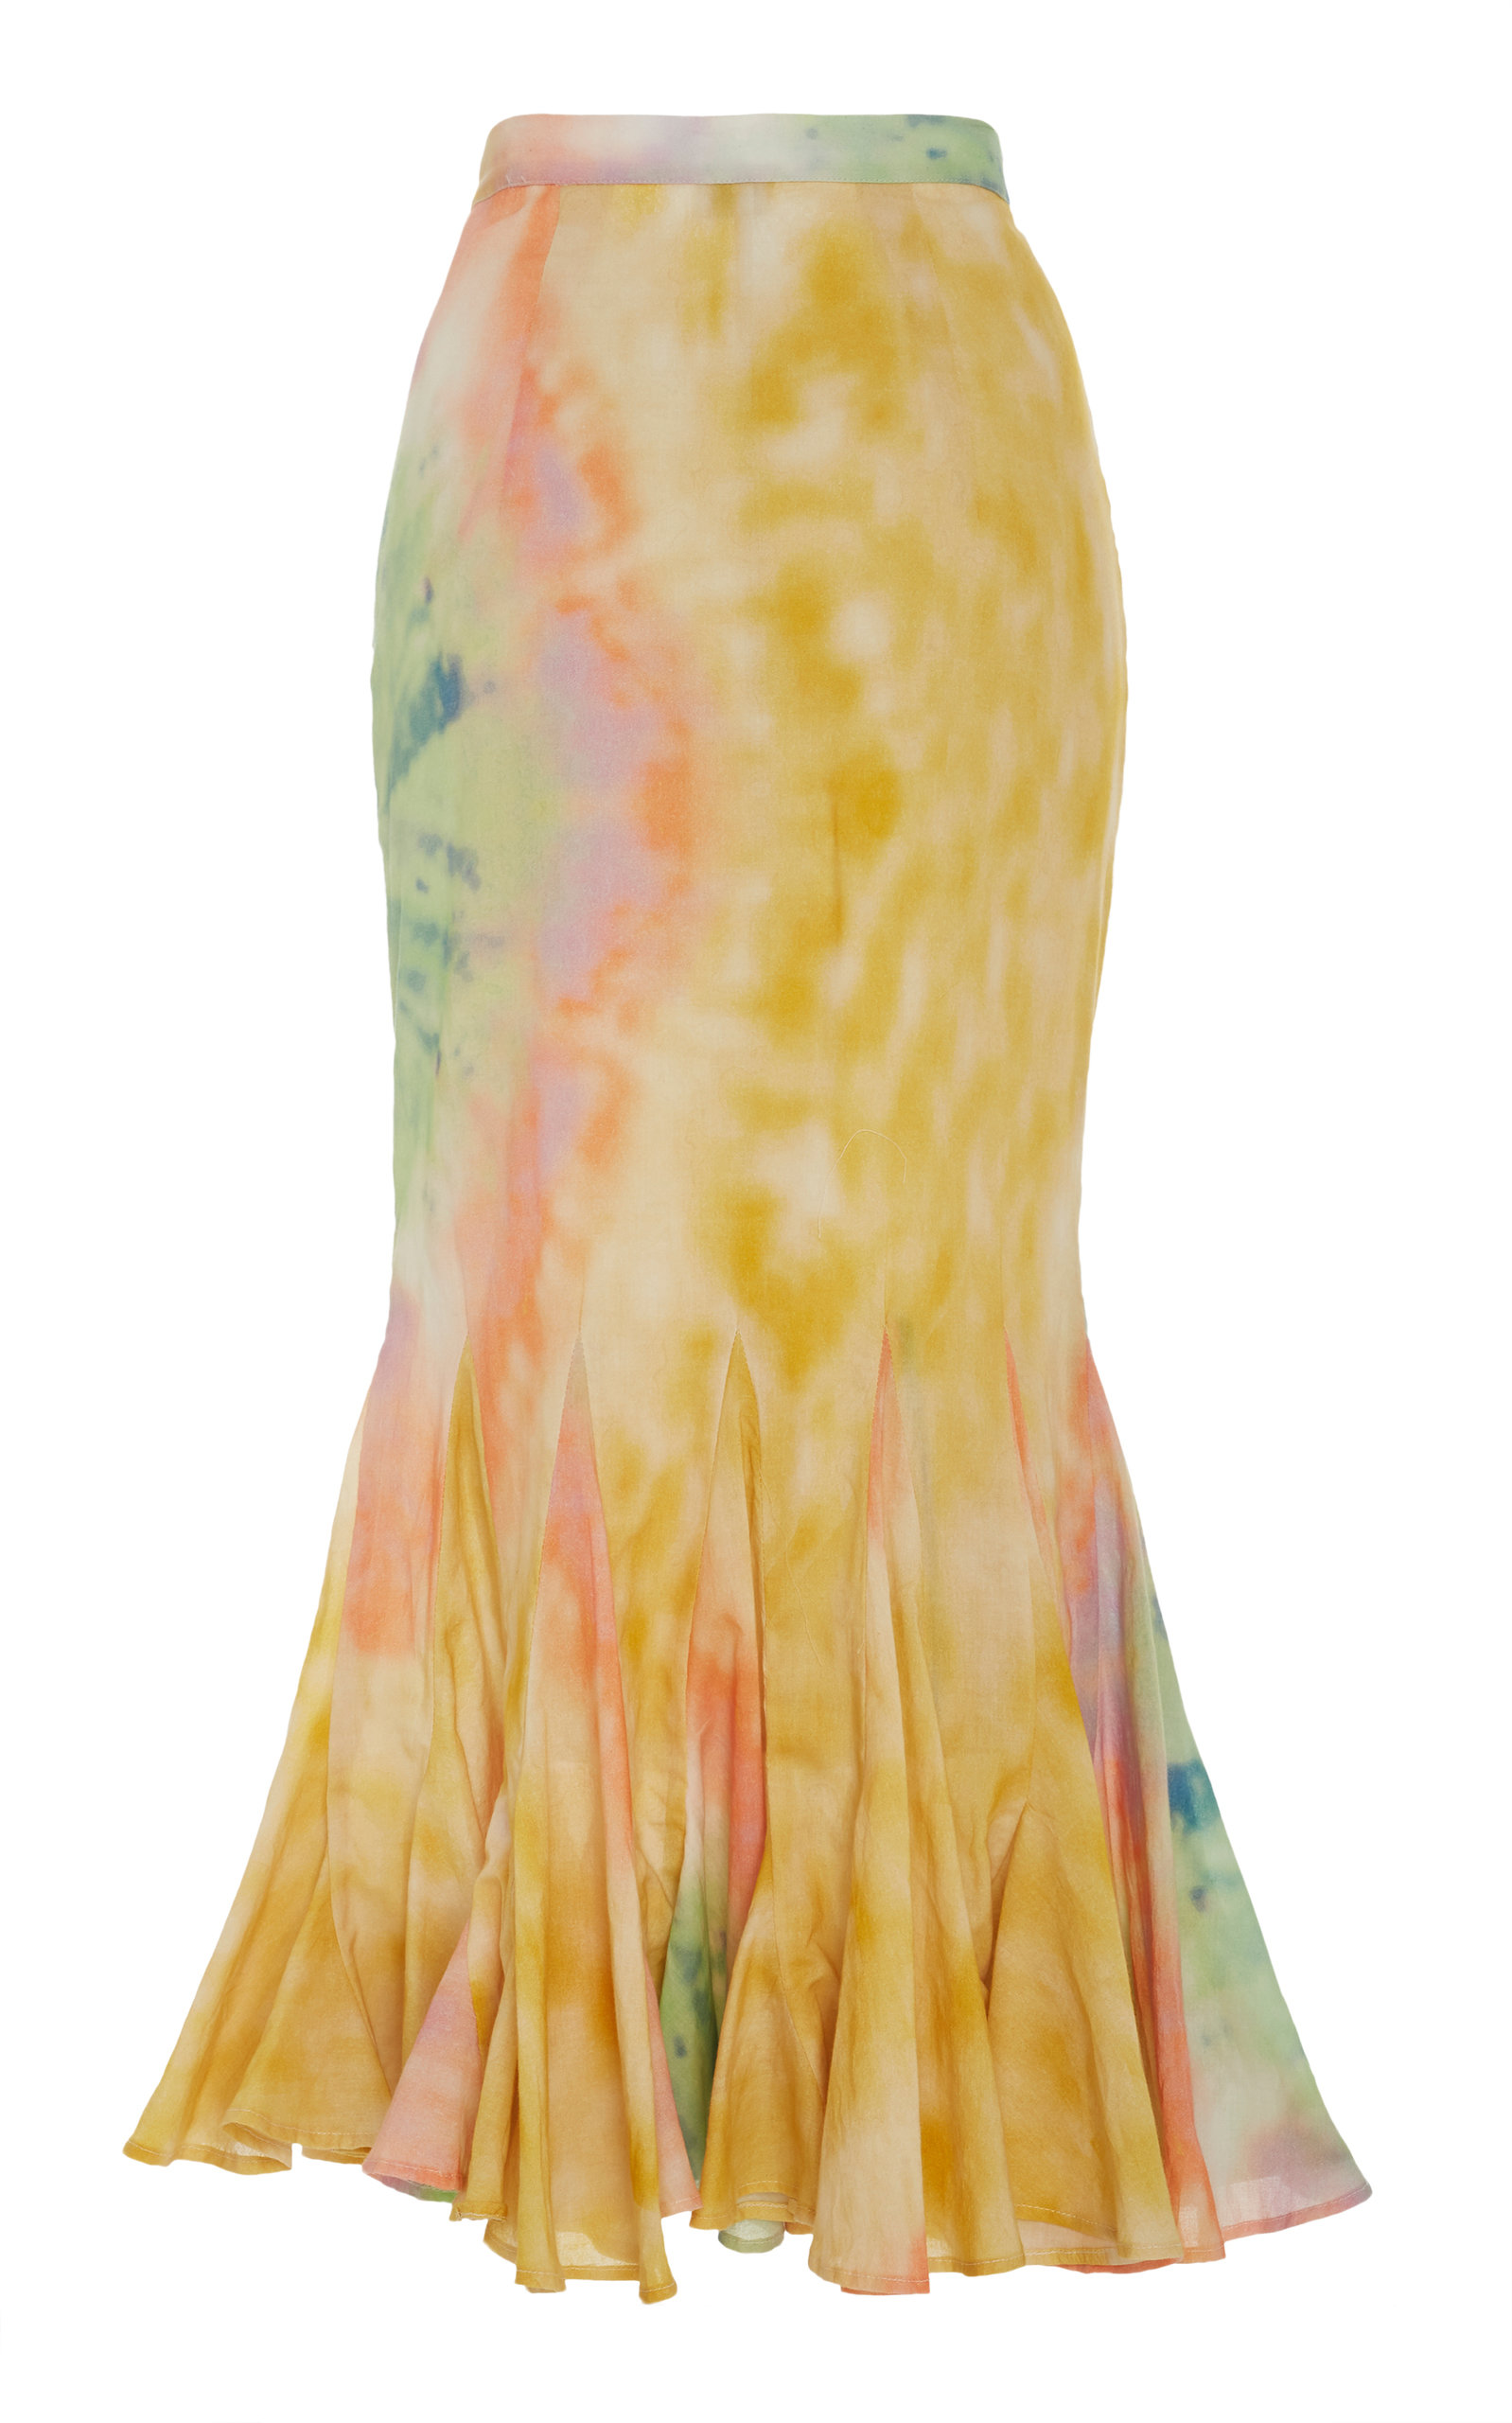 63383f19ebc71 RhodeSienna Pleated Tie-Dye Cotton Midi Skirt. CLOSE. Loading. Loading